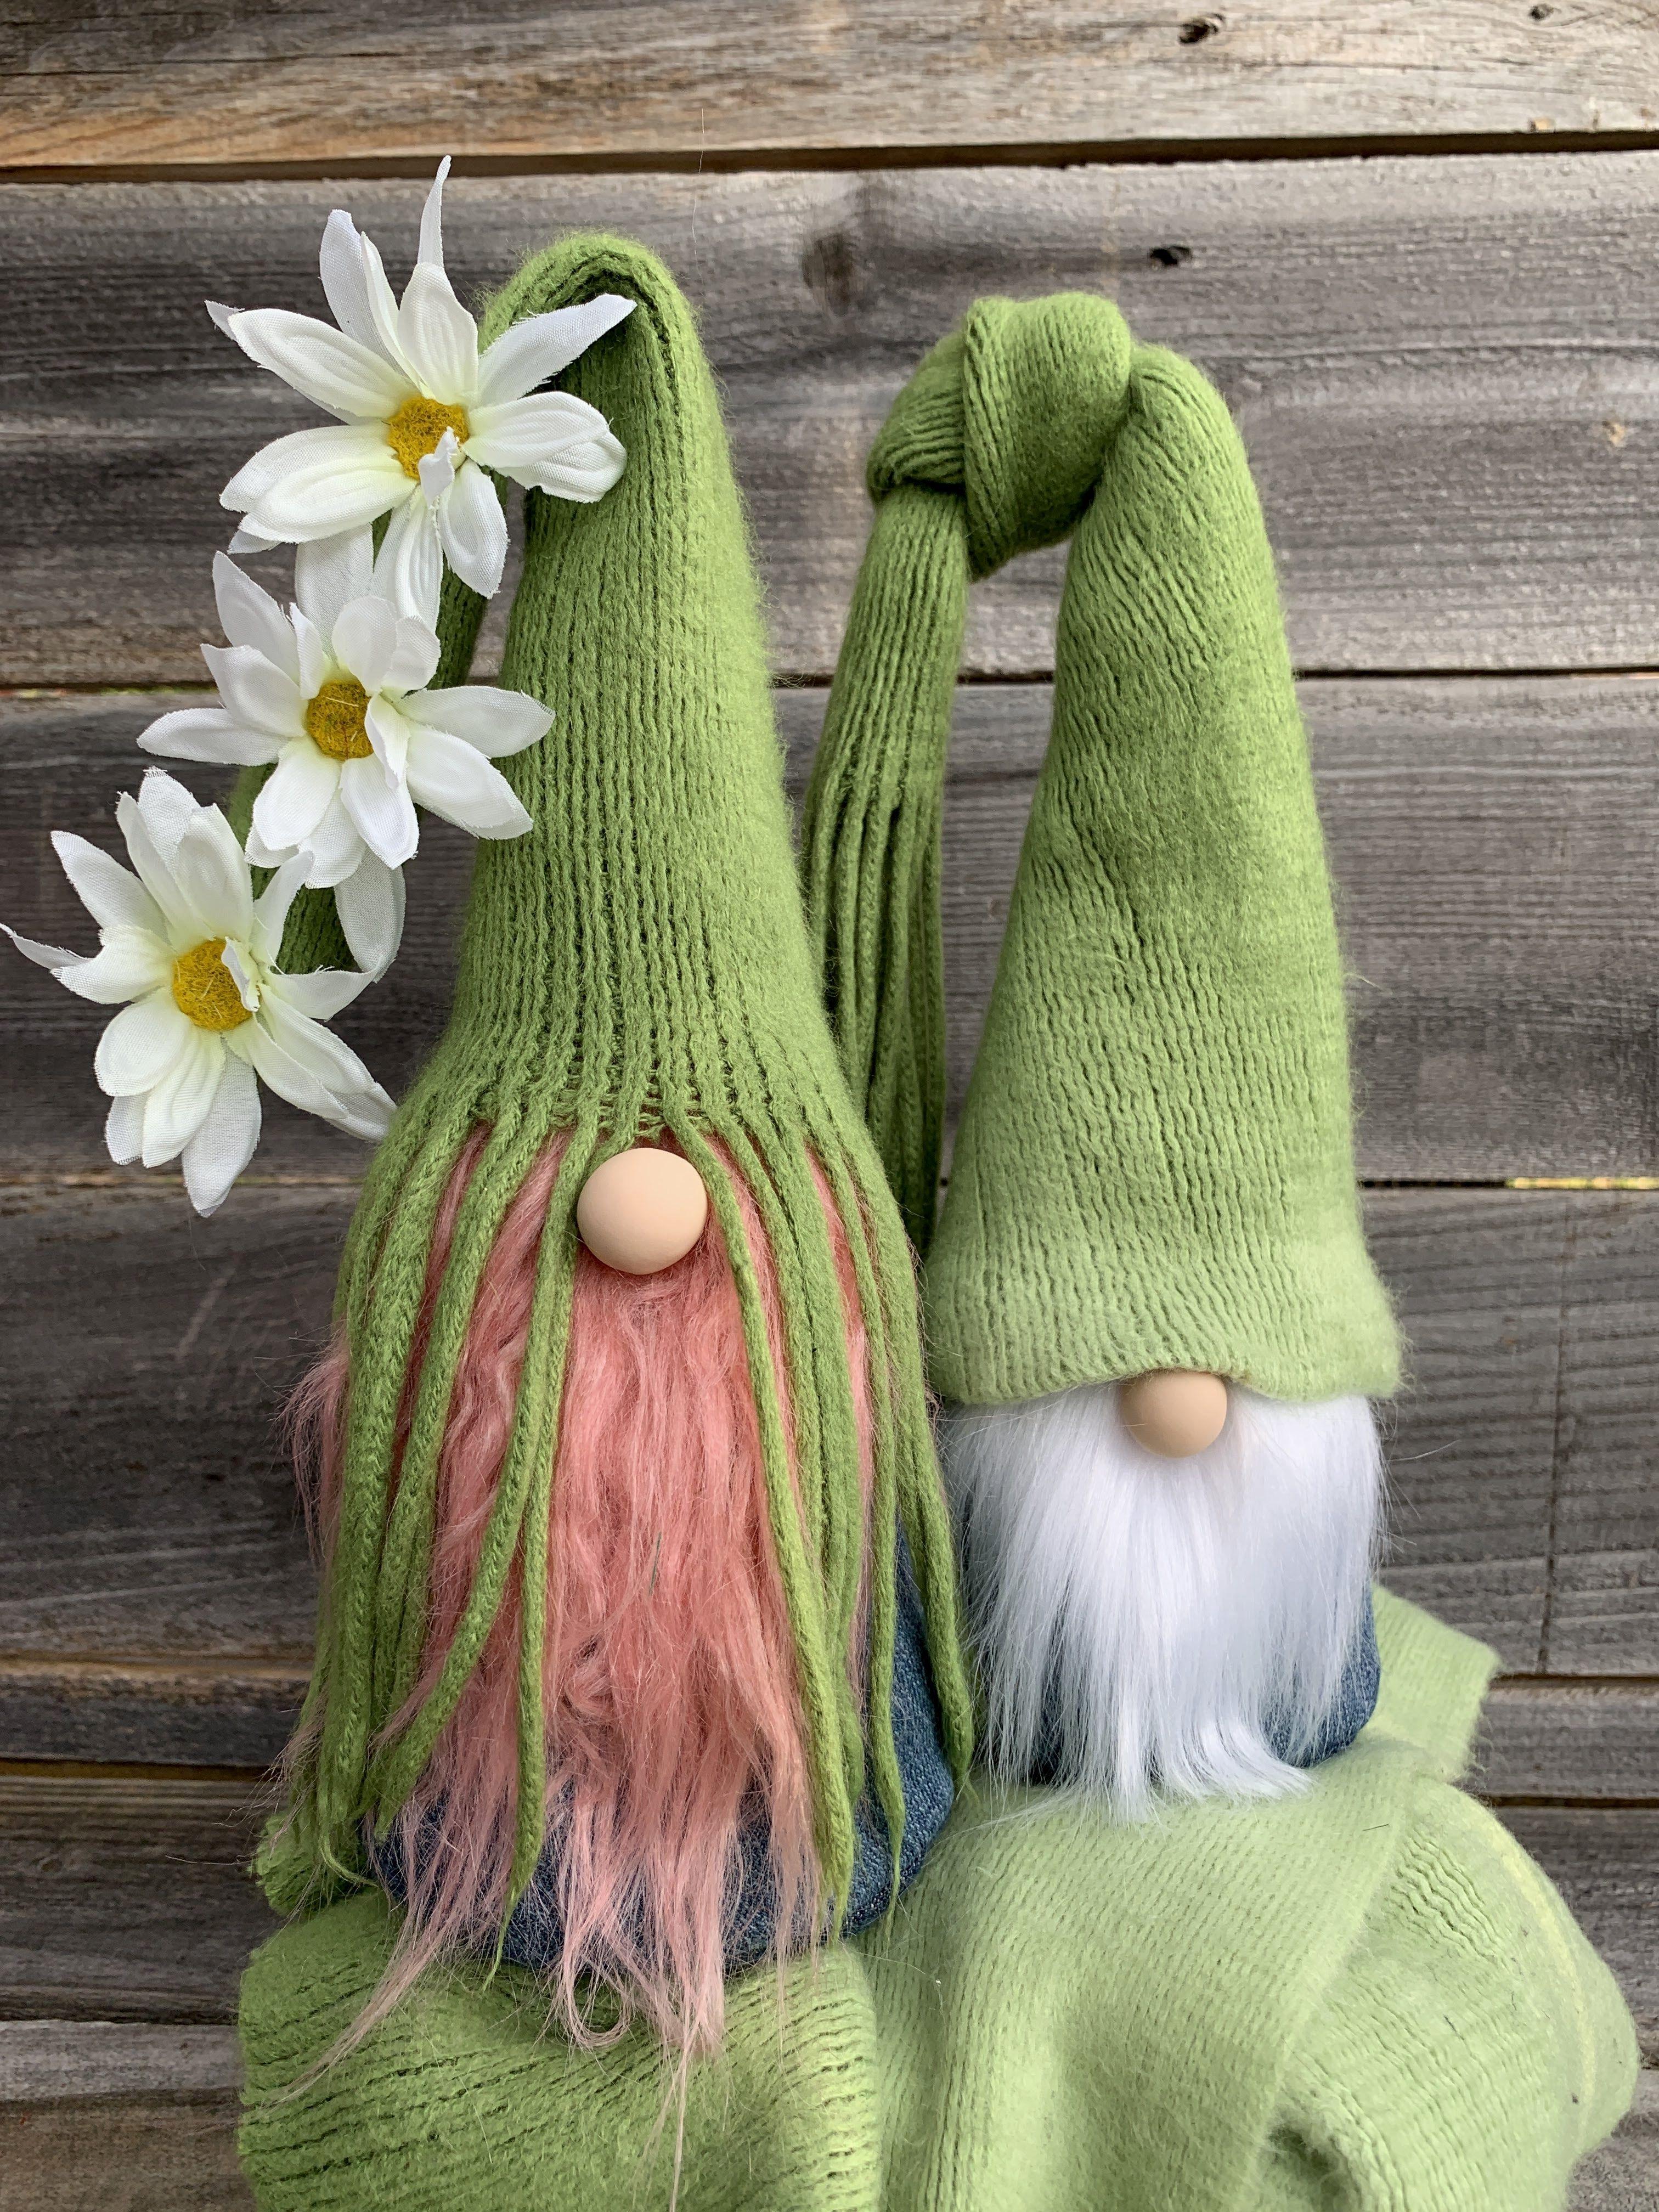 Pin by zabarovskiy.potap on DIY and Crafts Gnomes crafts